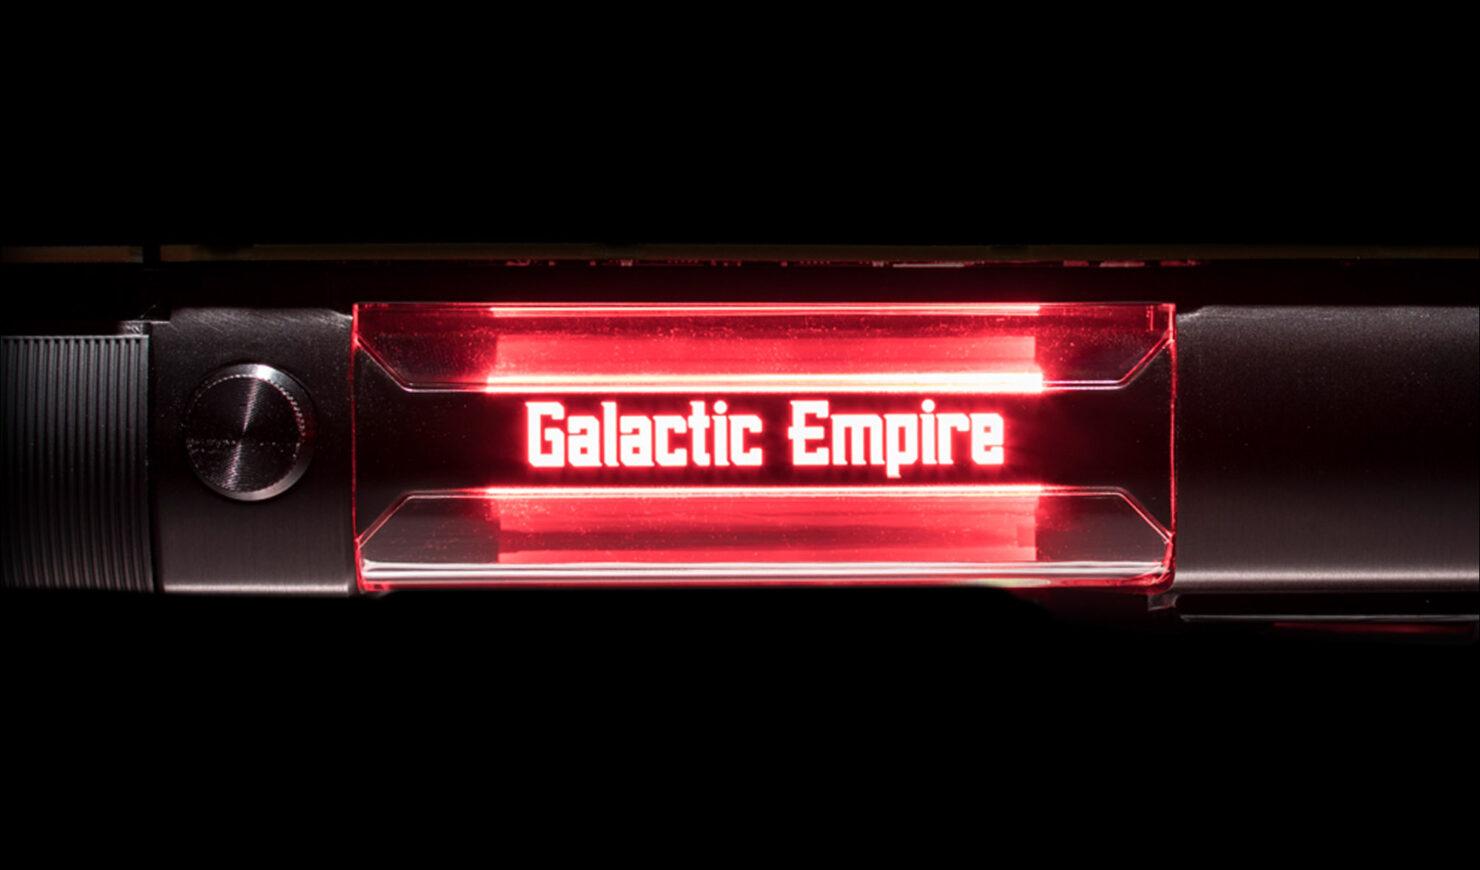 nvidia-titan-xp-ce-star-wars-galactic-empire-gallery-03